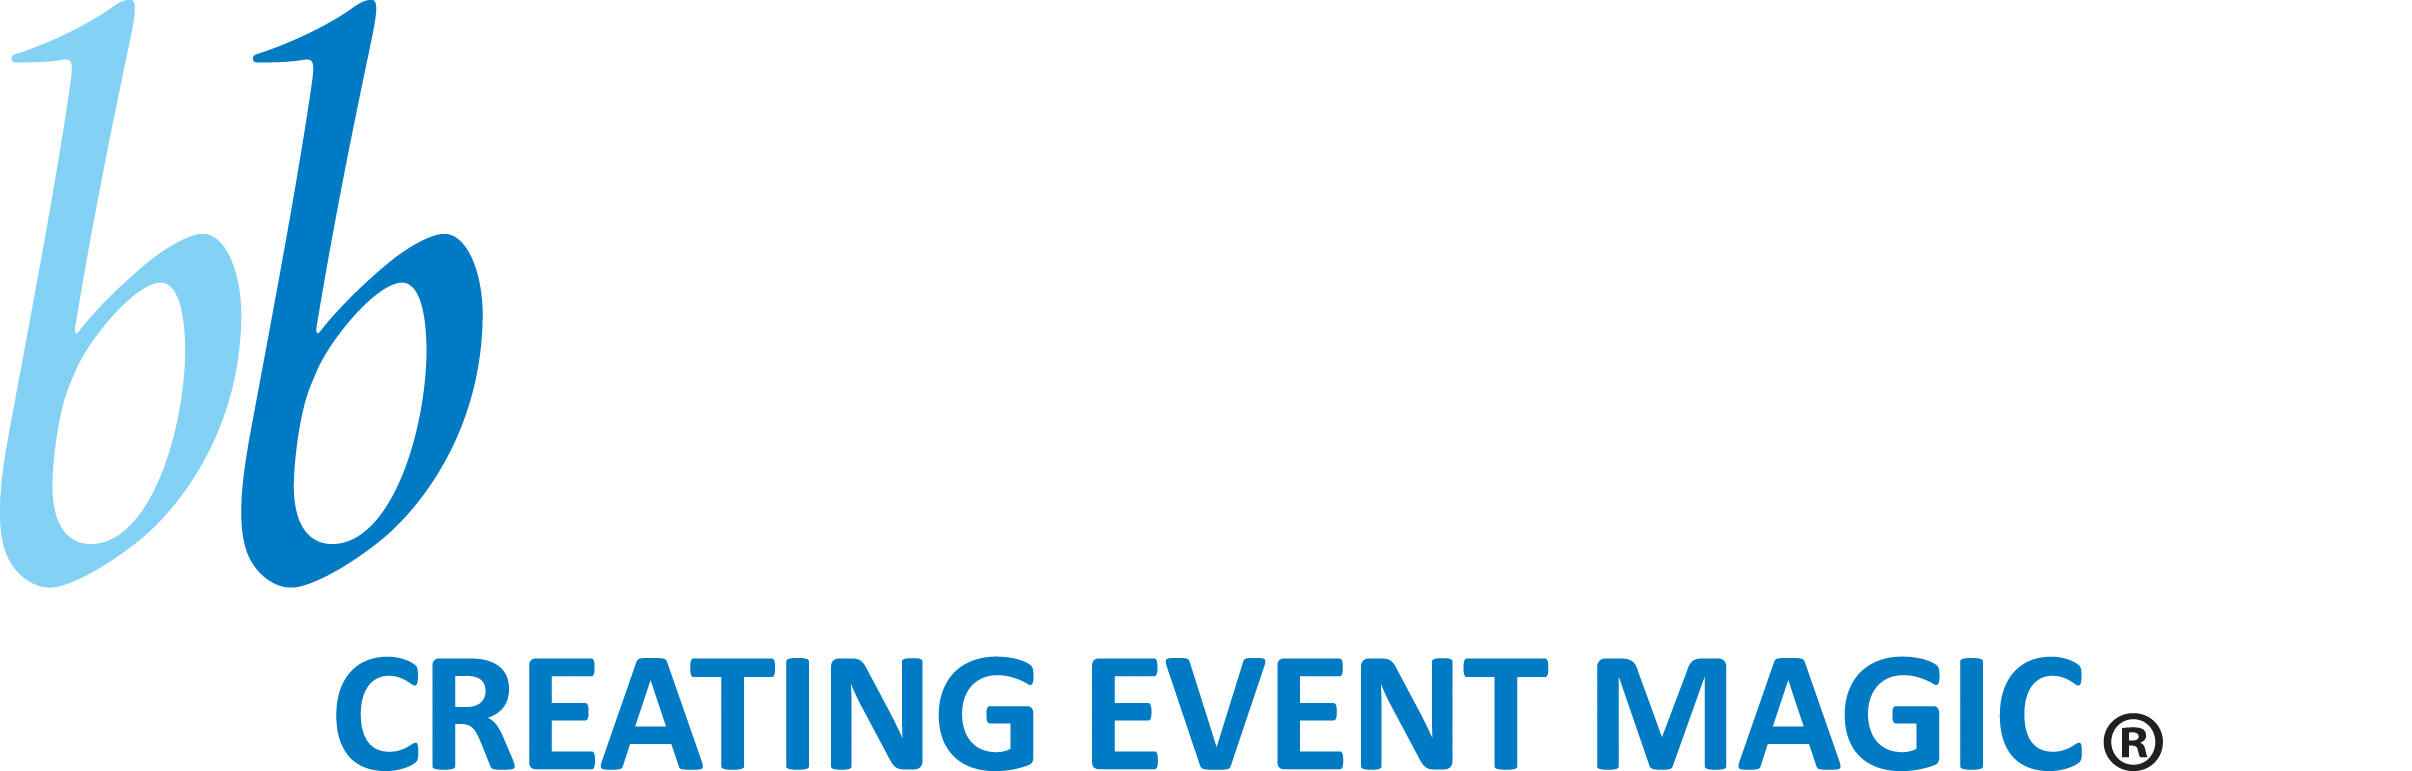 bbblanc-logo-white-cmyk